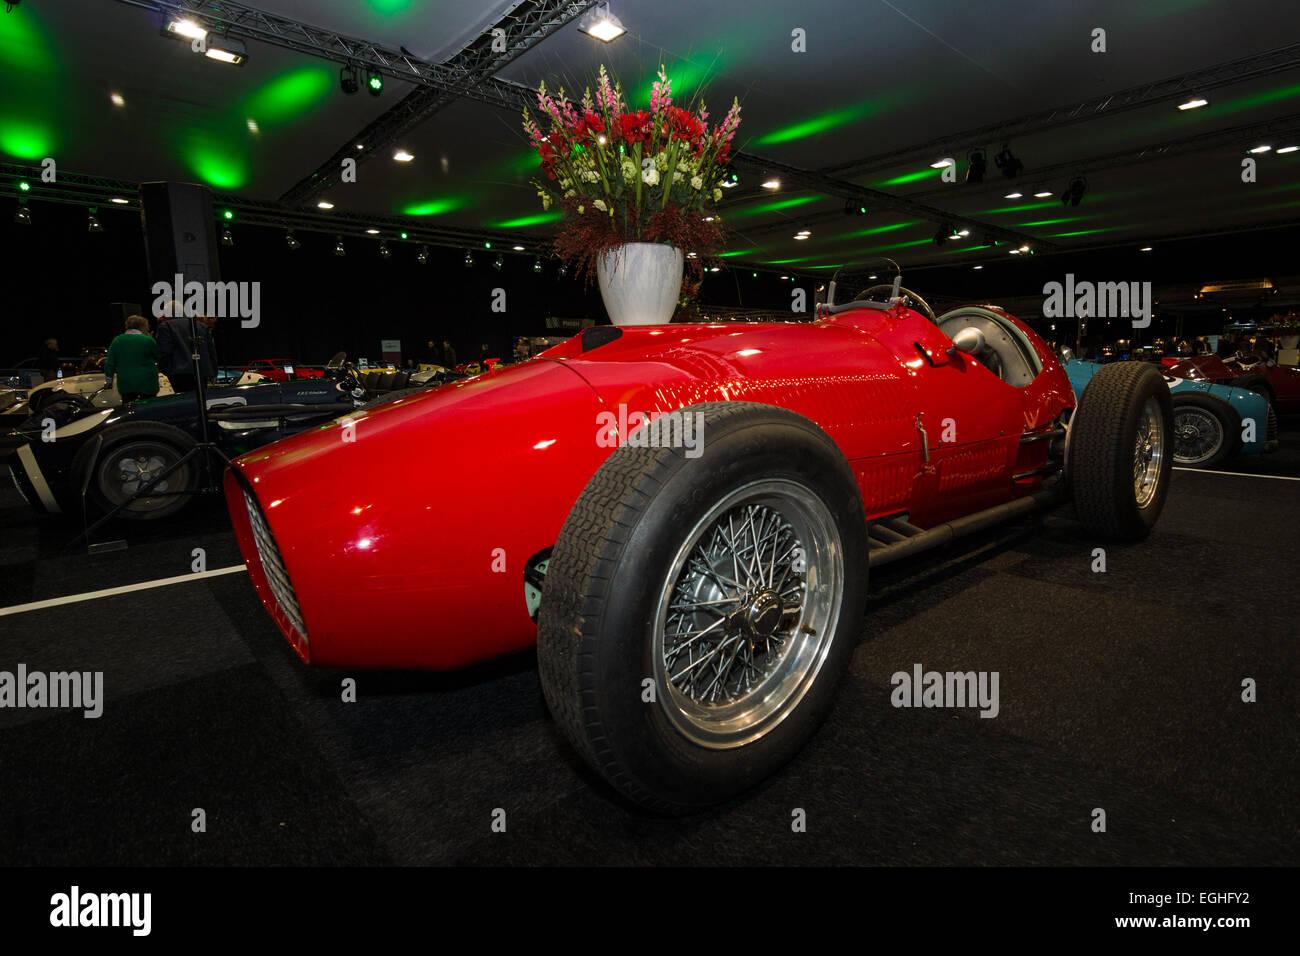 Formel 1 Rennwagen Ferrari 340 F1 1950 Stockfoto Bild 79061670